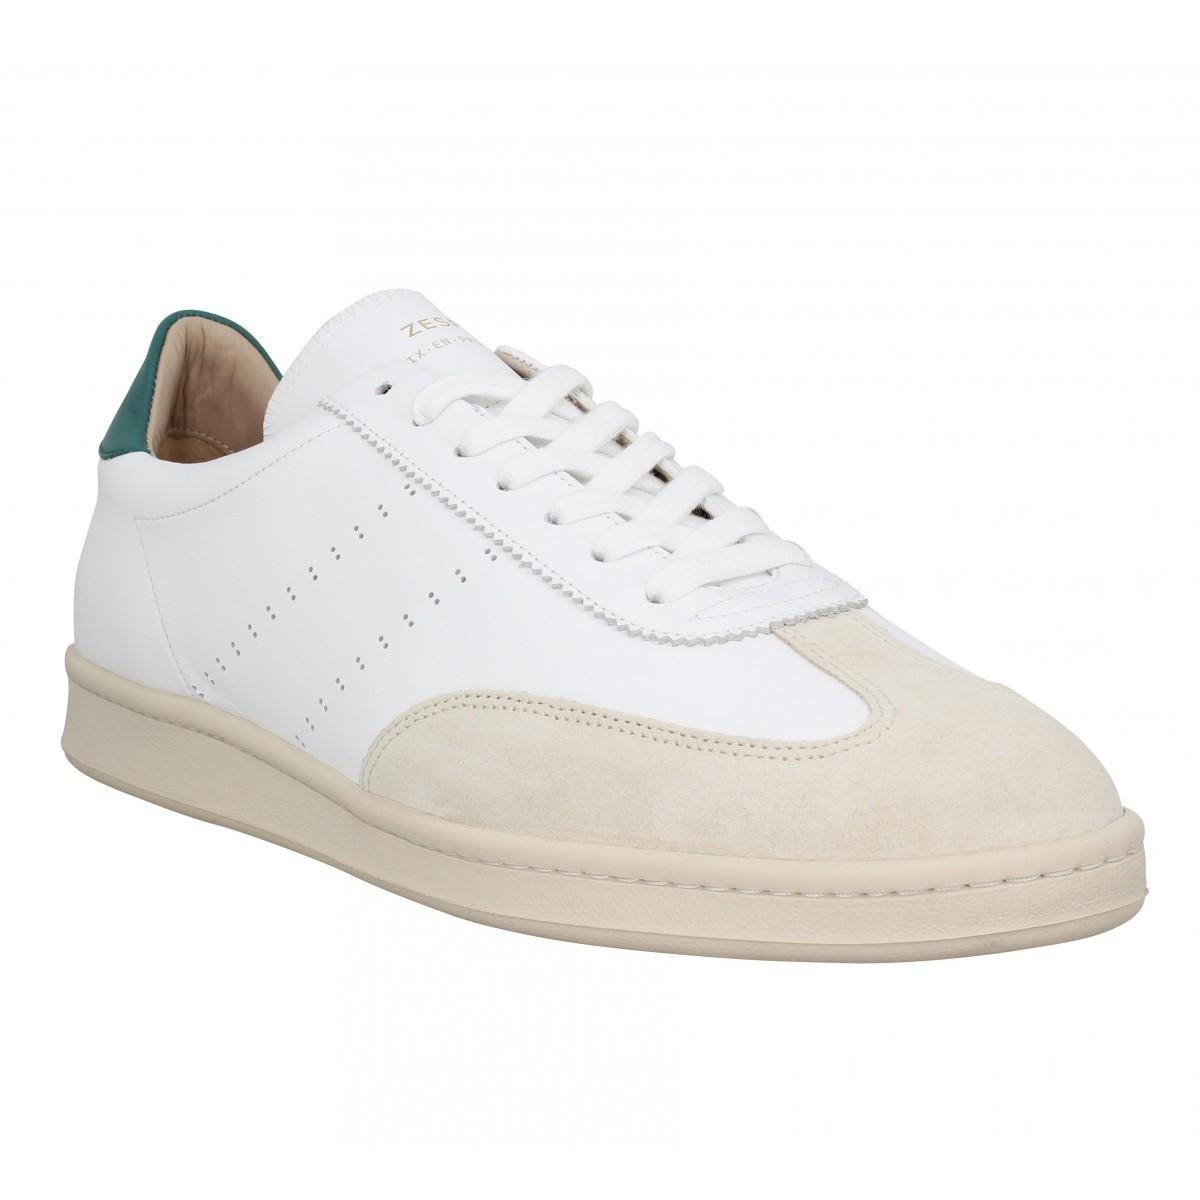 Baskets ZESPA ZSPGT cuir Homme Blanc Cypres